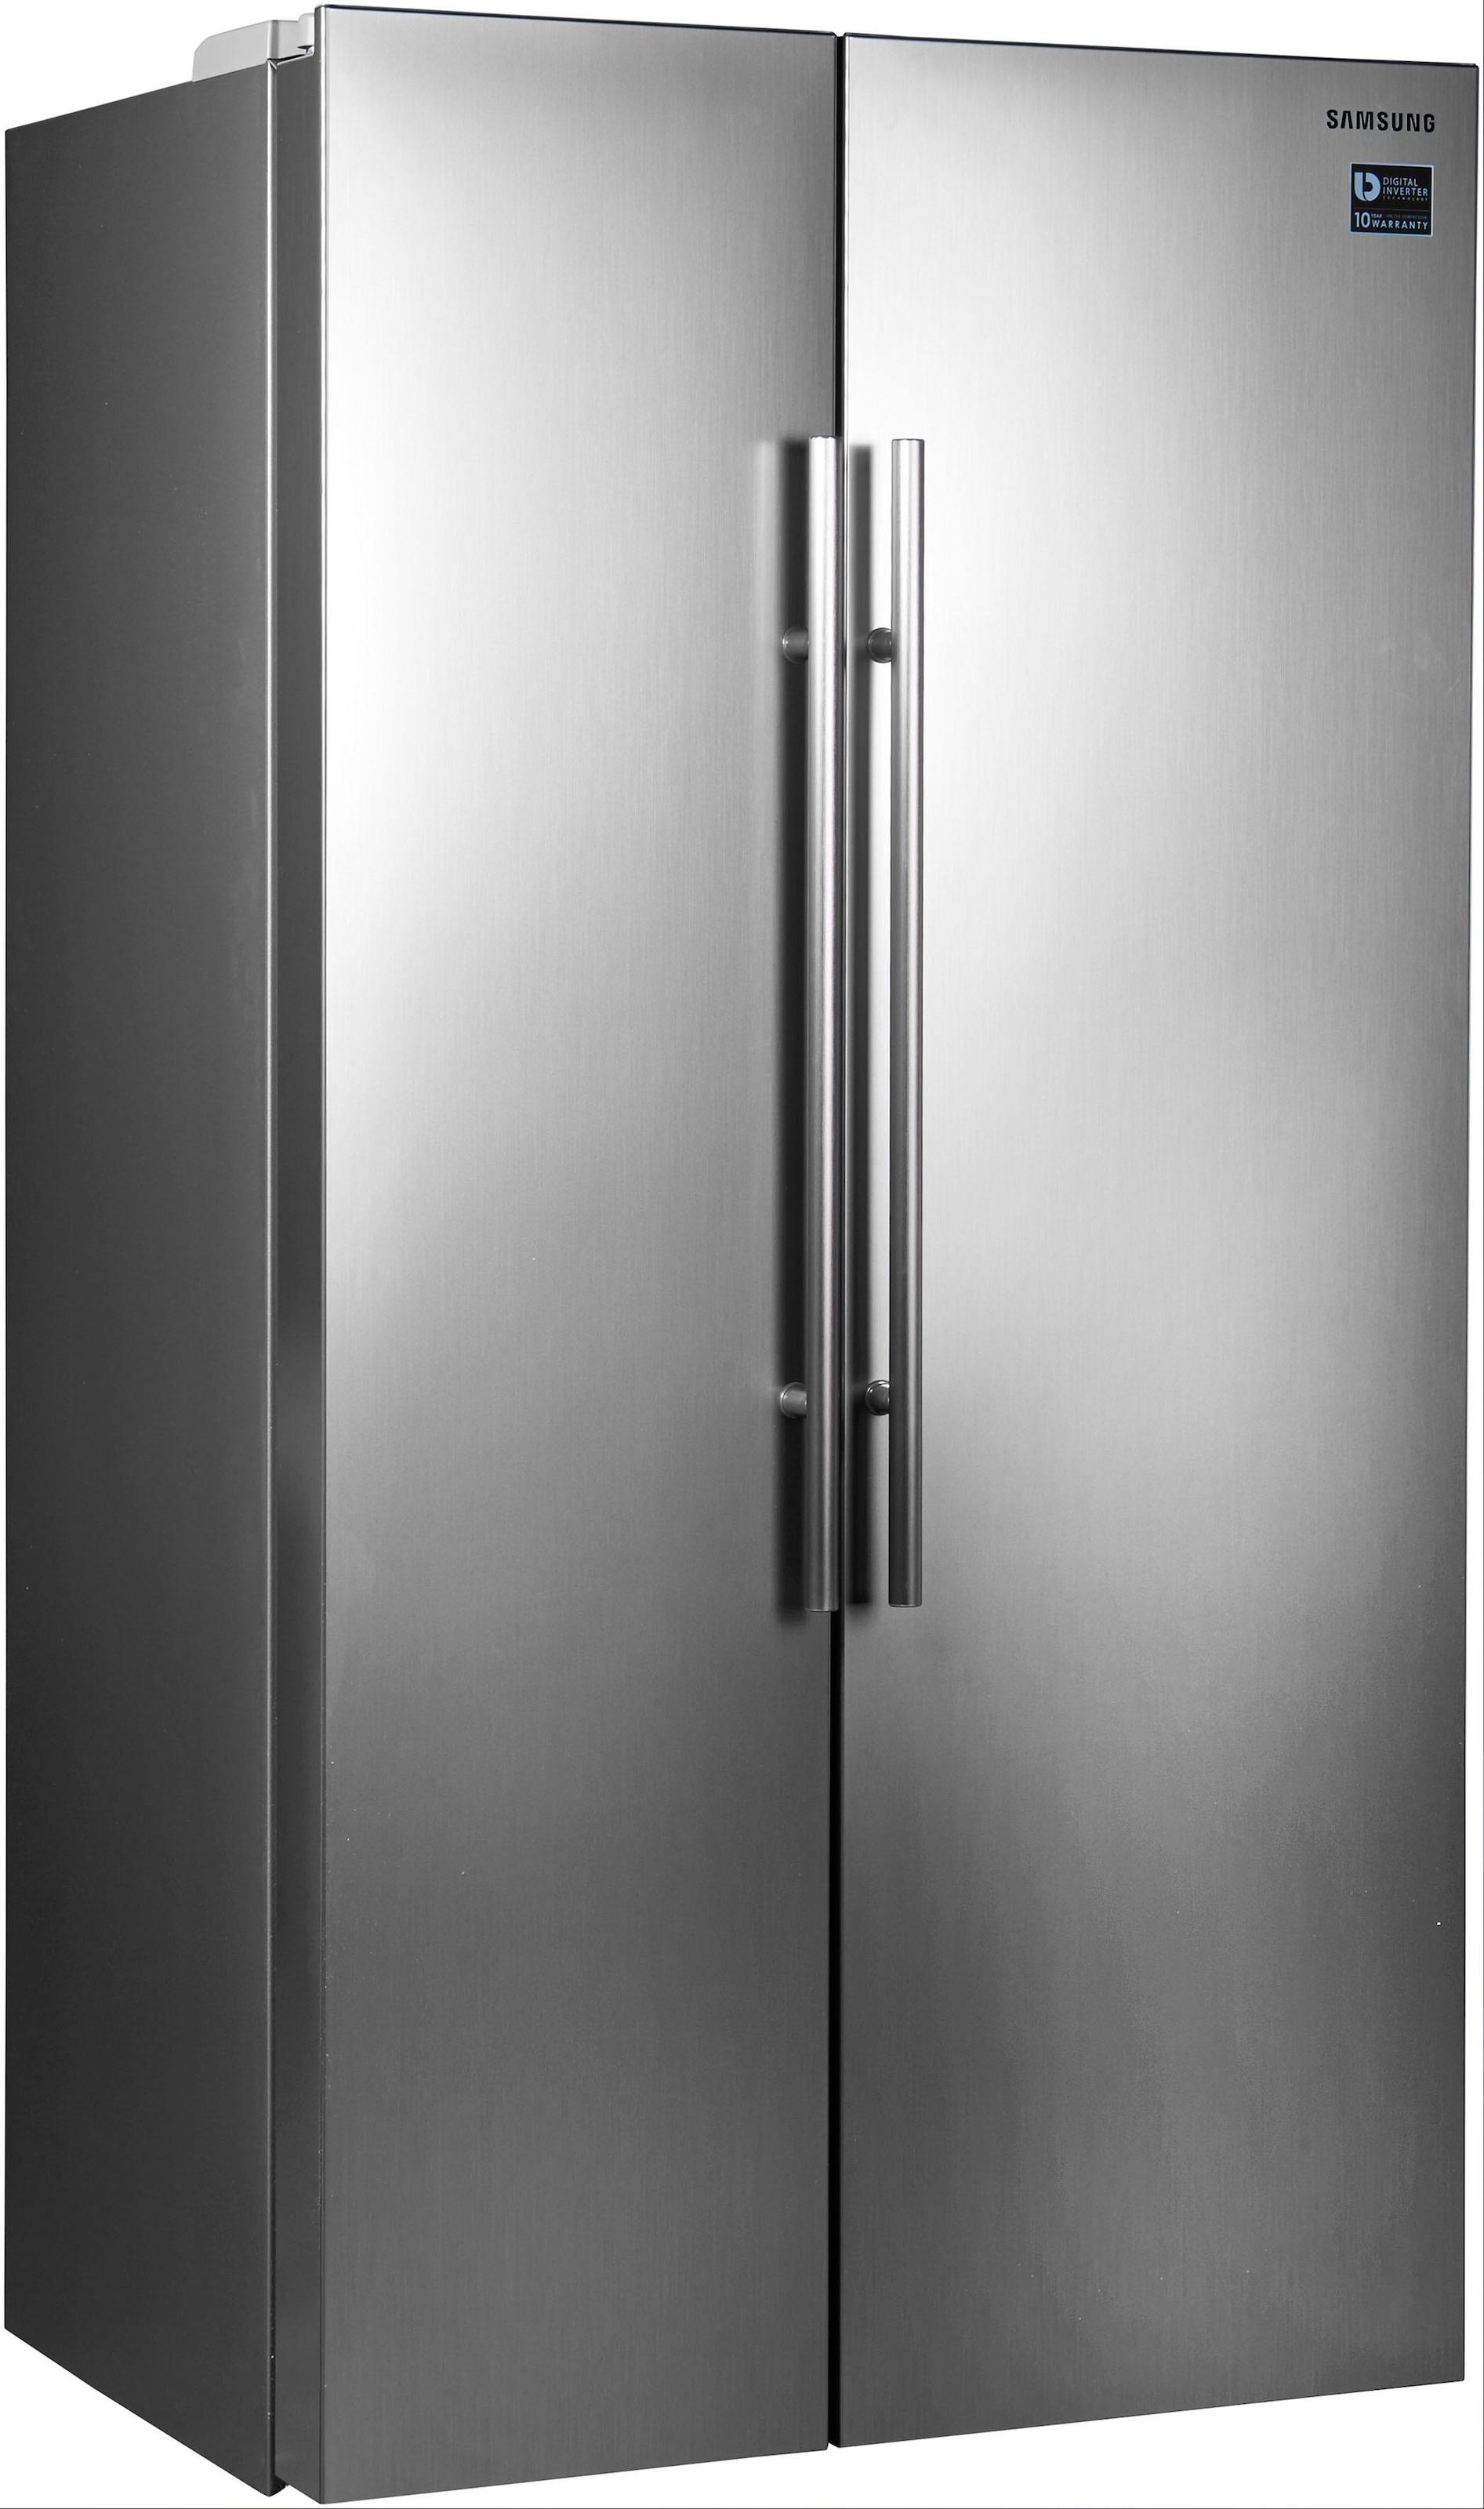 Samsung Side By Side Kühlschrank Weiß : Side by side kühlschrank auf rechnung raten kaufen